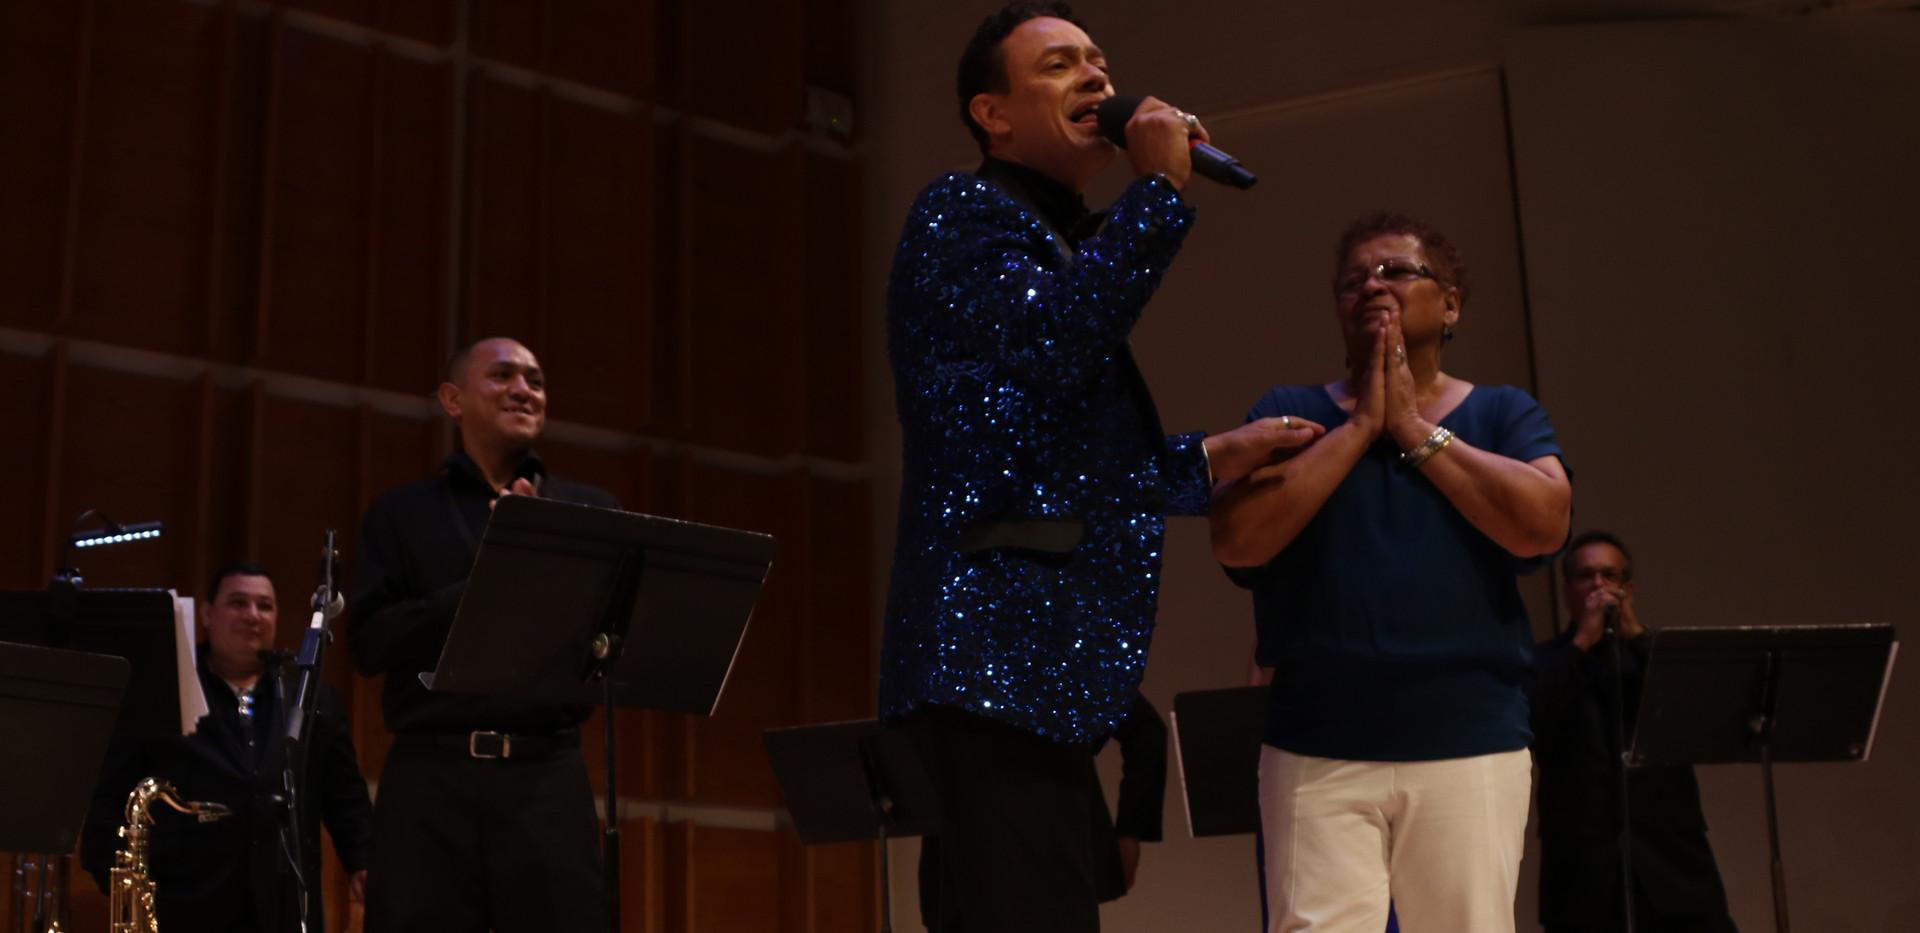 Javier Luis Live at Merkin Concert Hall NYC